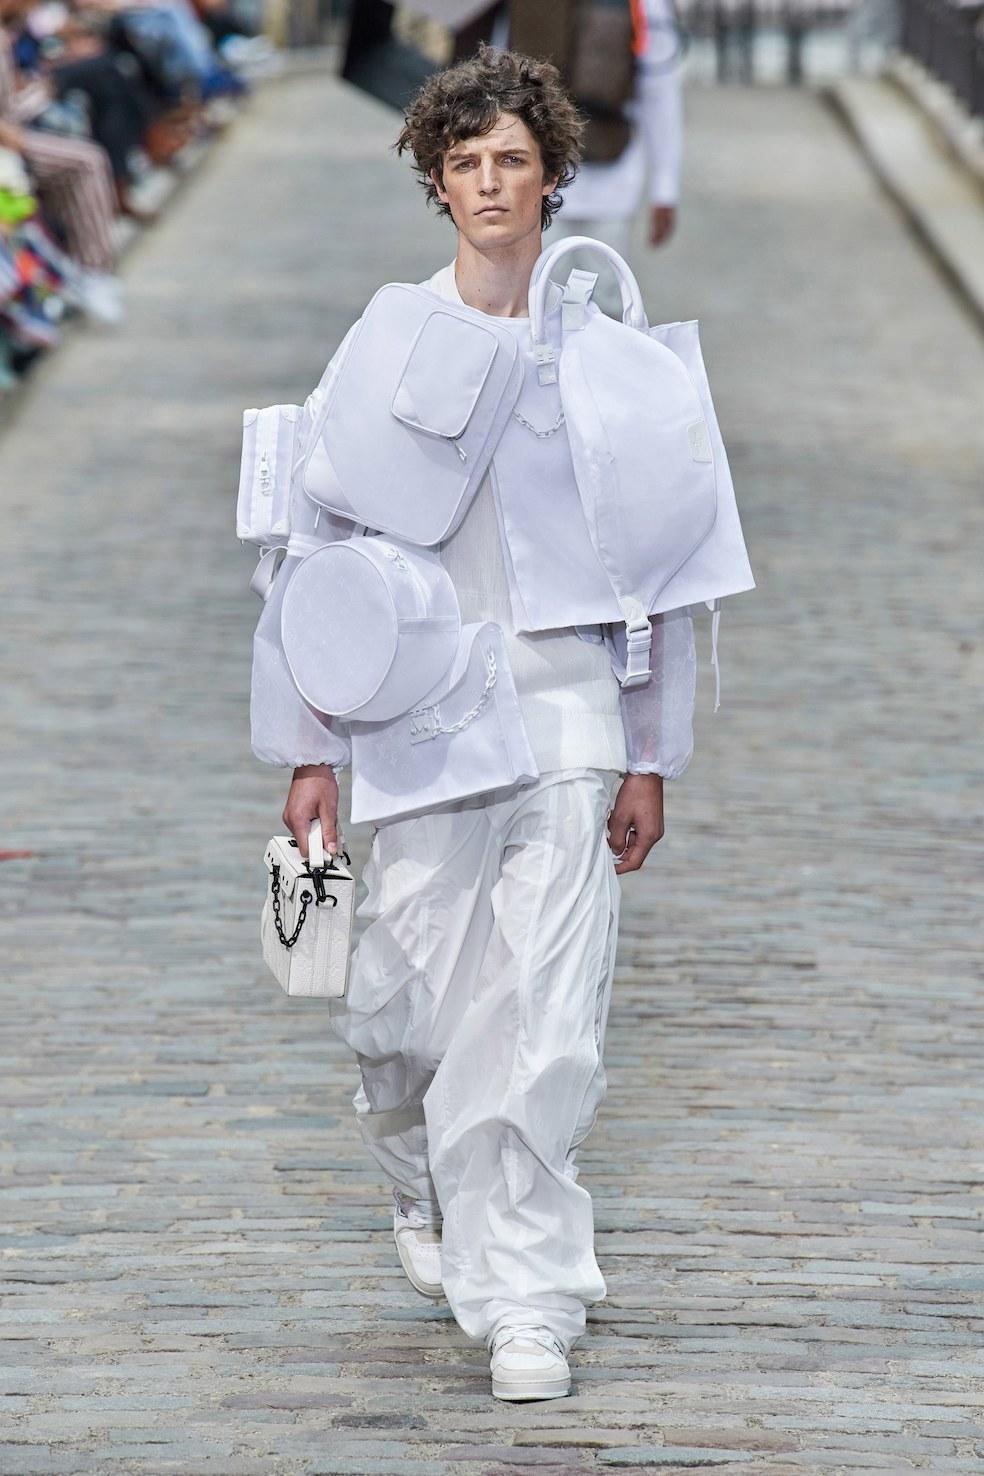 Louis_Vuitton_SS20_Behind_The_Blinds_Magazine__FIO0834.jpg